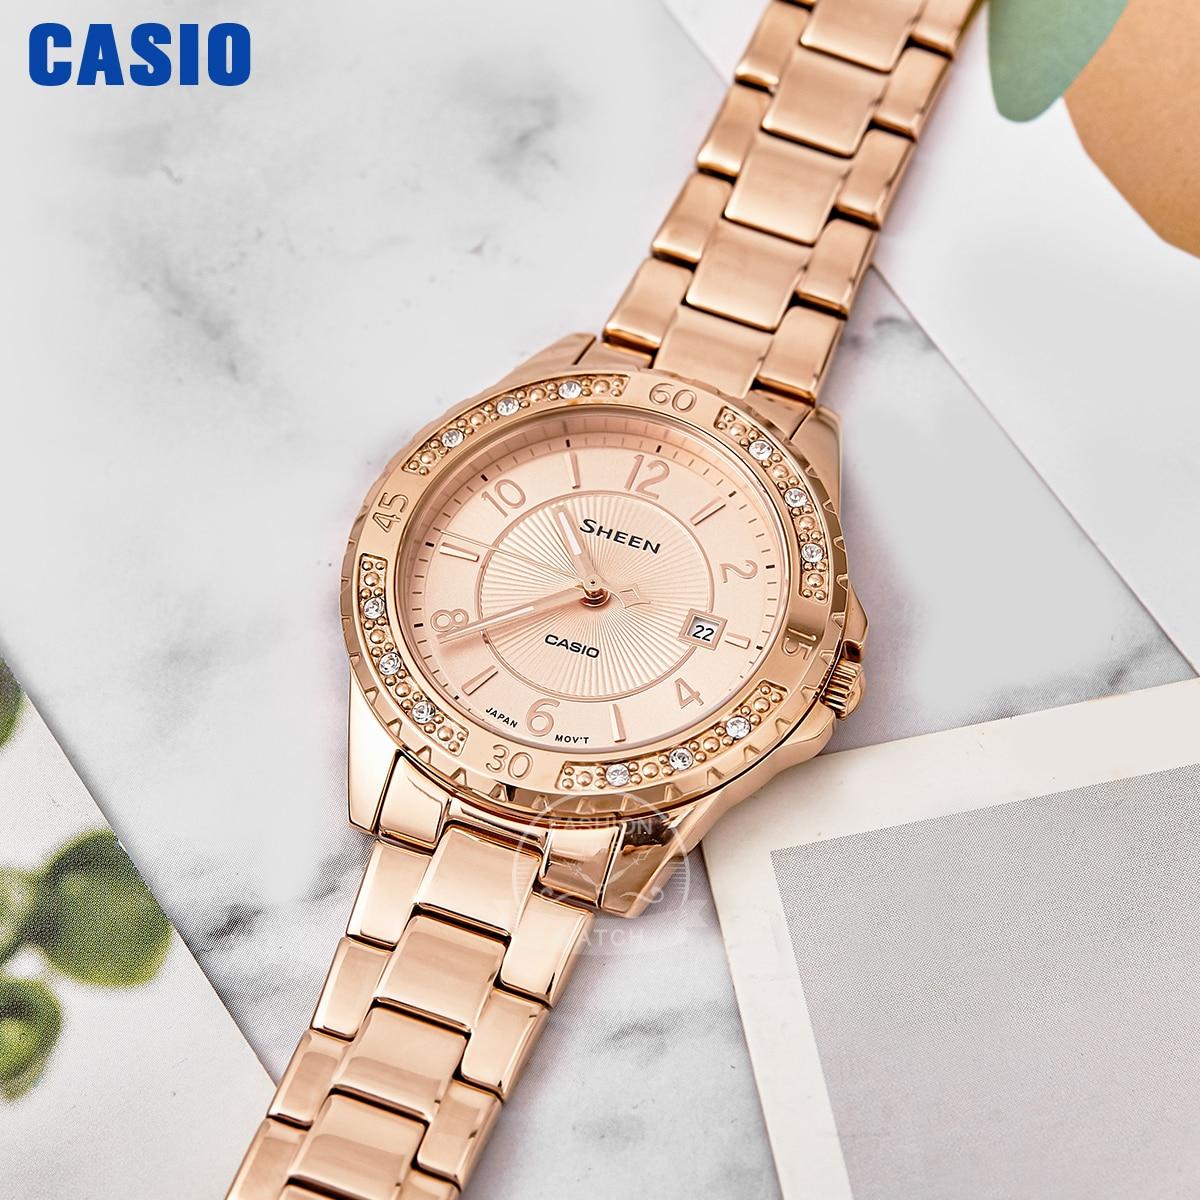 Casio watch ladies luxury  Swarovski diamond sapphire glass Rose women watch girl  watch 50m waterproof quartz relogio SHE4532PG